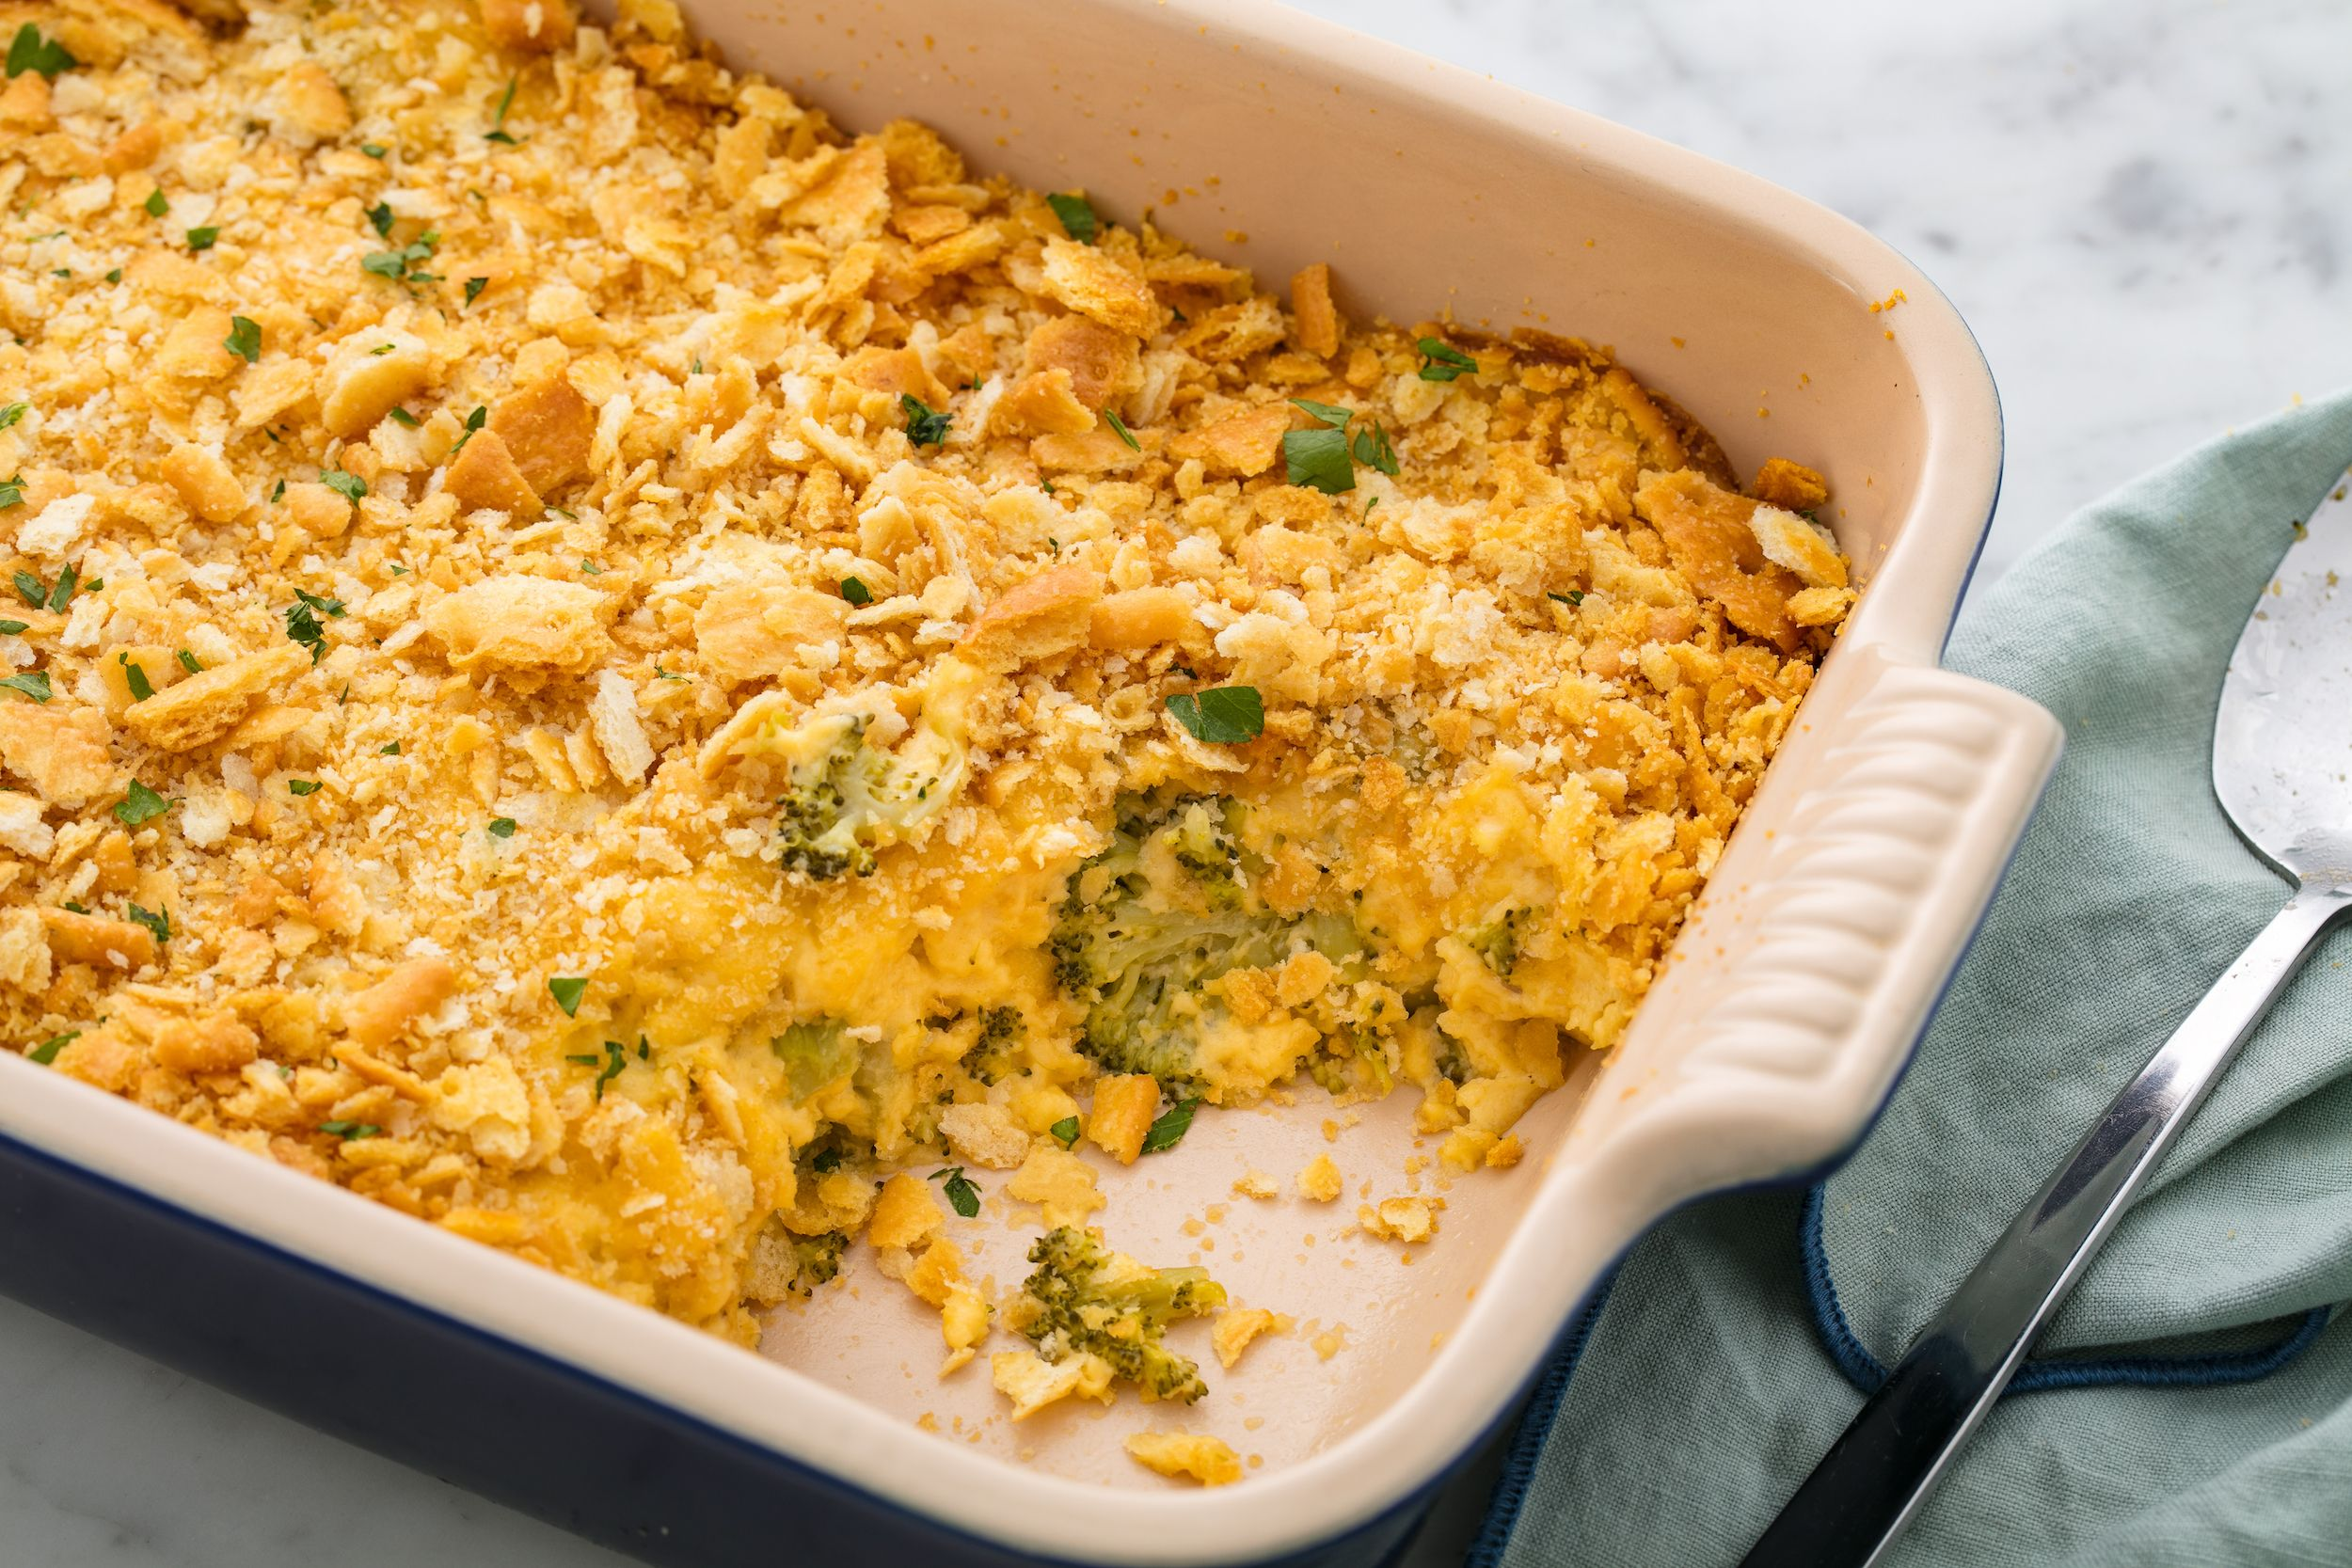 Easy Broccoli Cheese Casserole Recipe How To Make Cheesy Broccoli Casserole